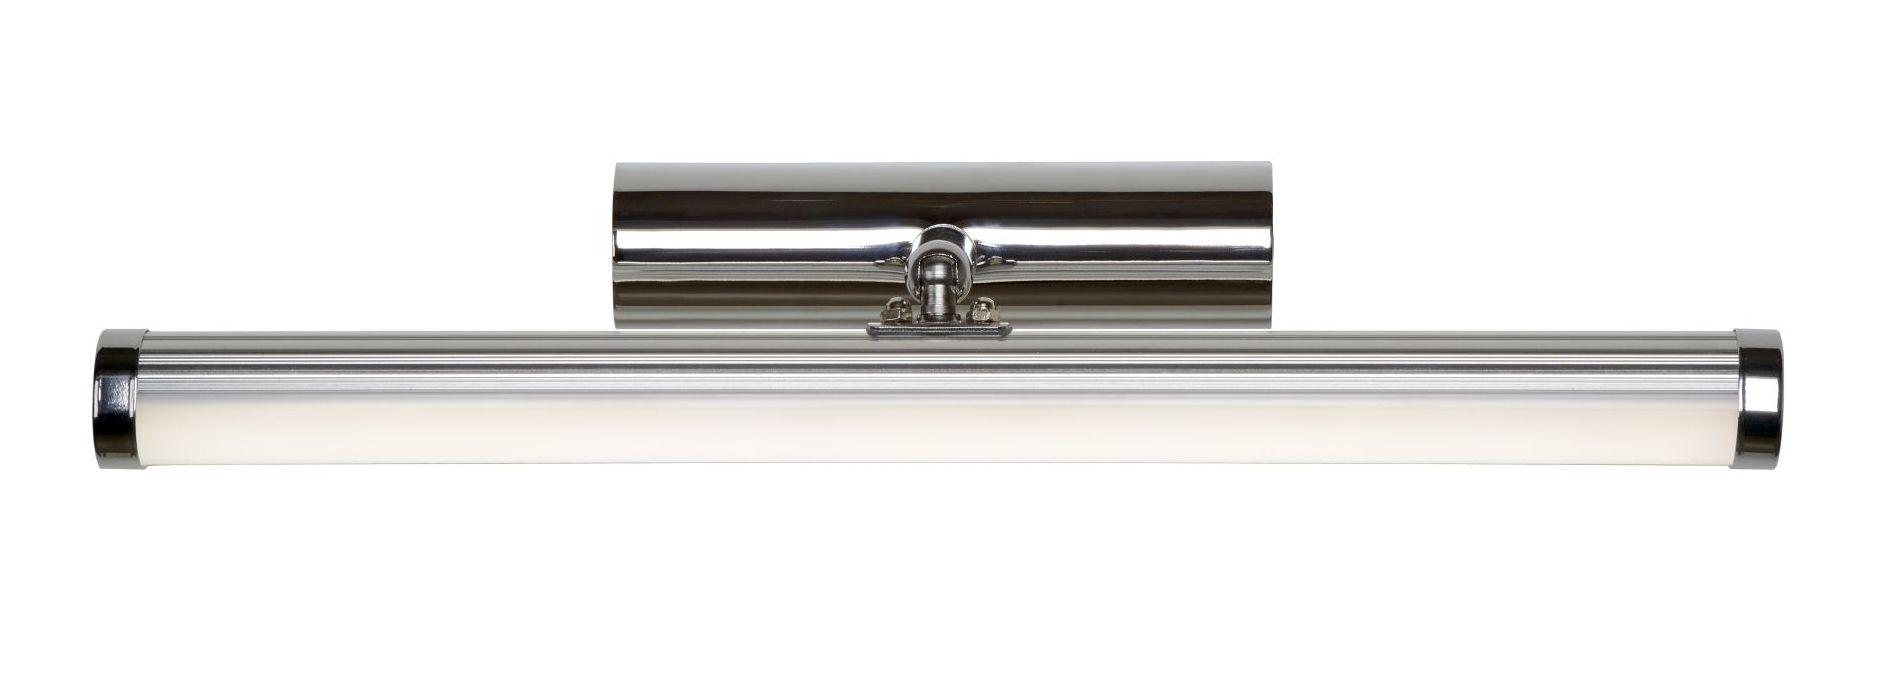 Lampa ścienna BELPA-LED - 39210/07/11